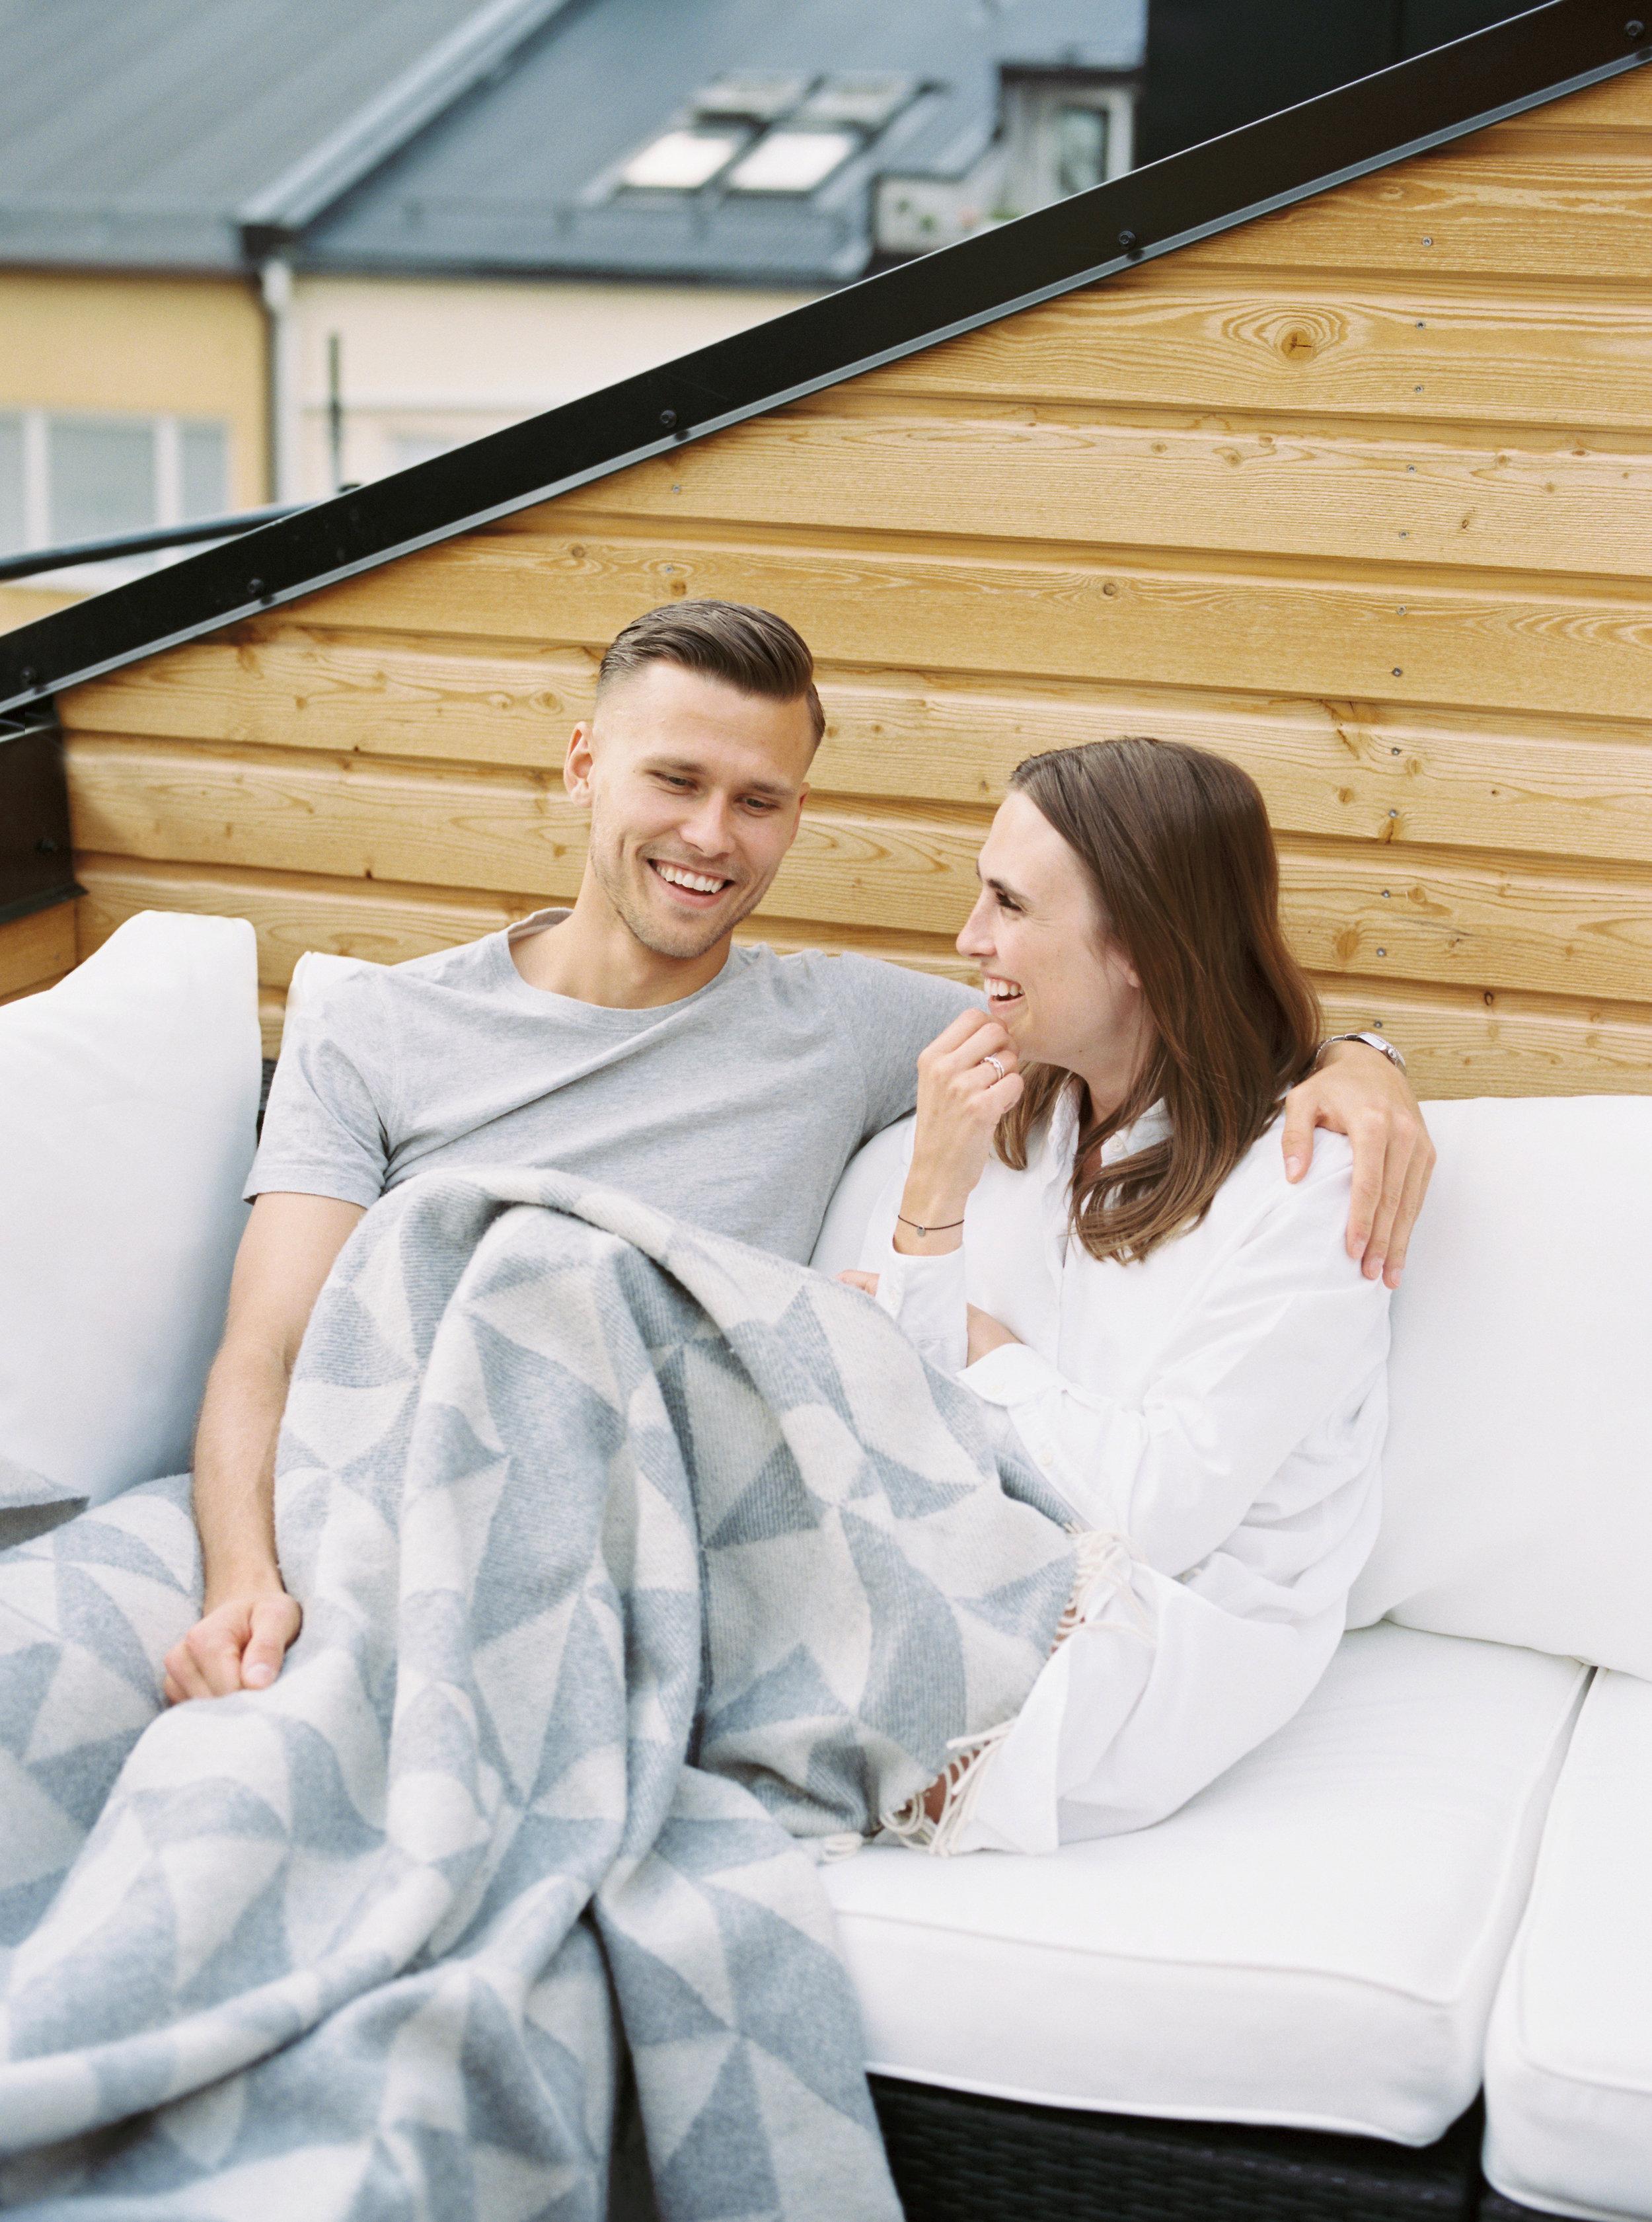 Kyle John l Fine Art Wedding Photography l Chicago, Copenhagen, California, New York, Destination l Blog l Andrea Rofn and Arnór Ingvi Traustason_World Cup 2018_30